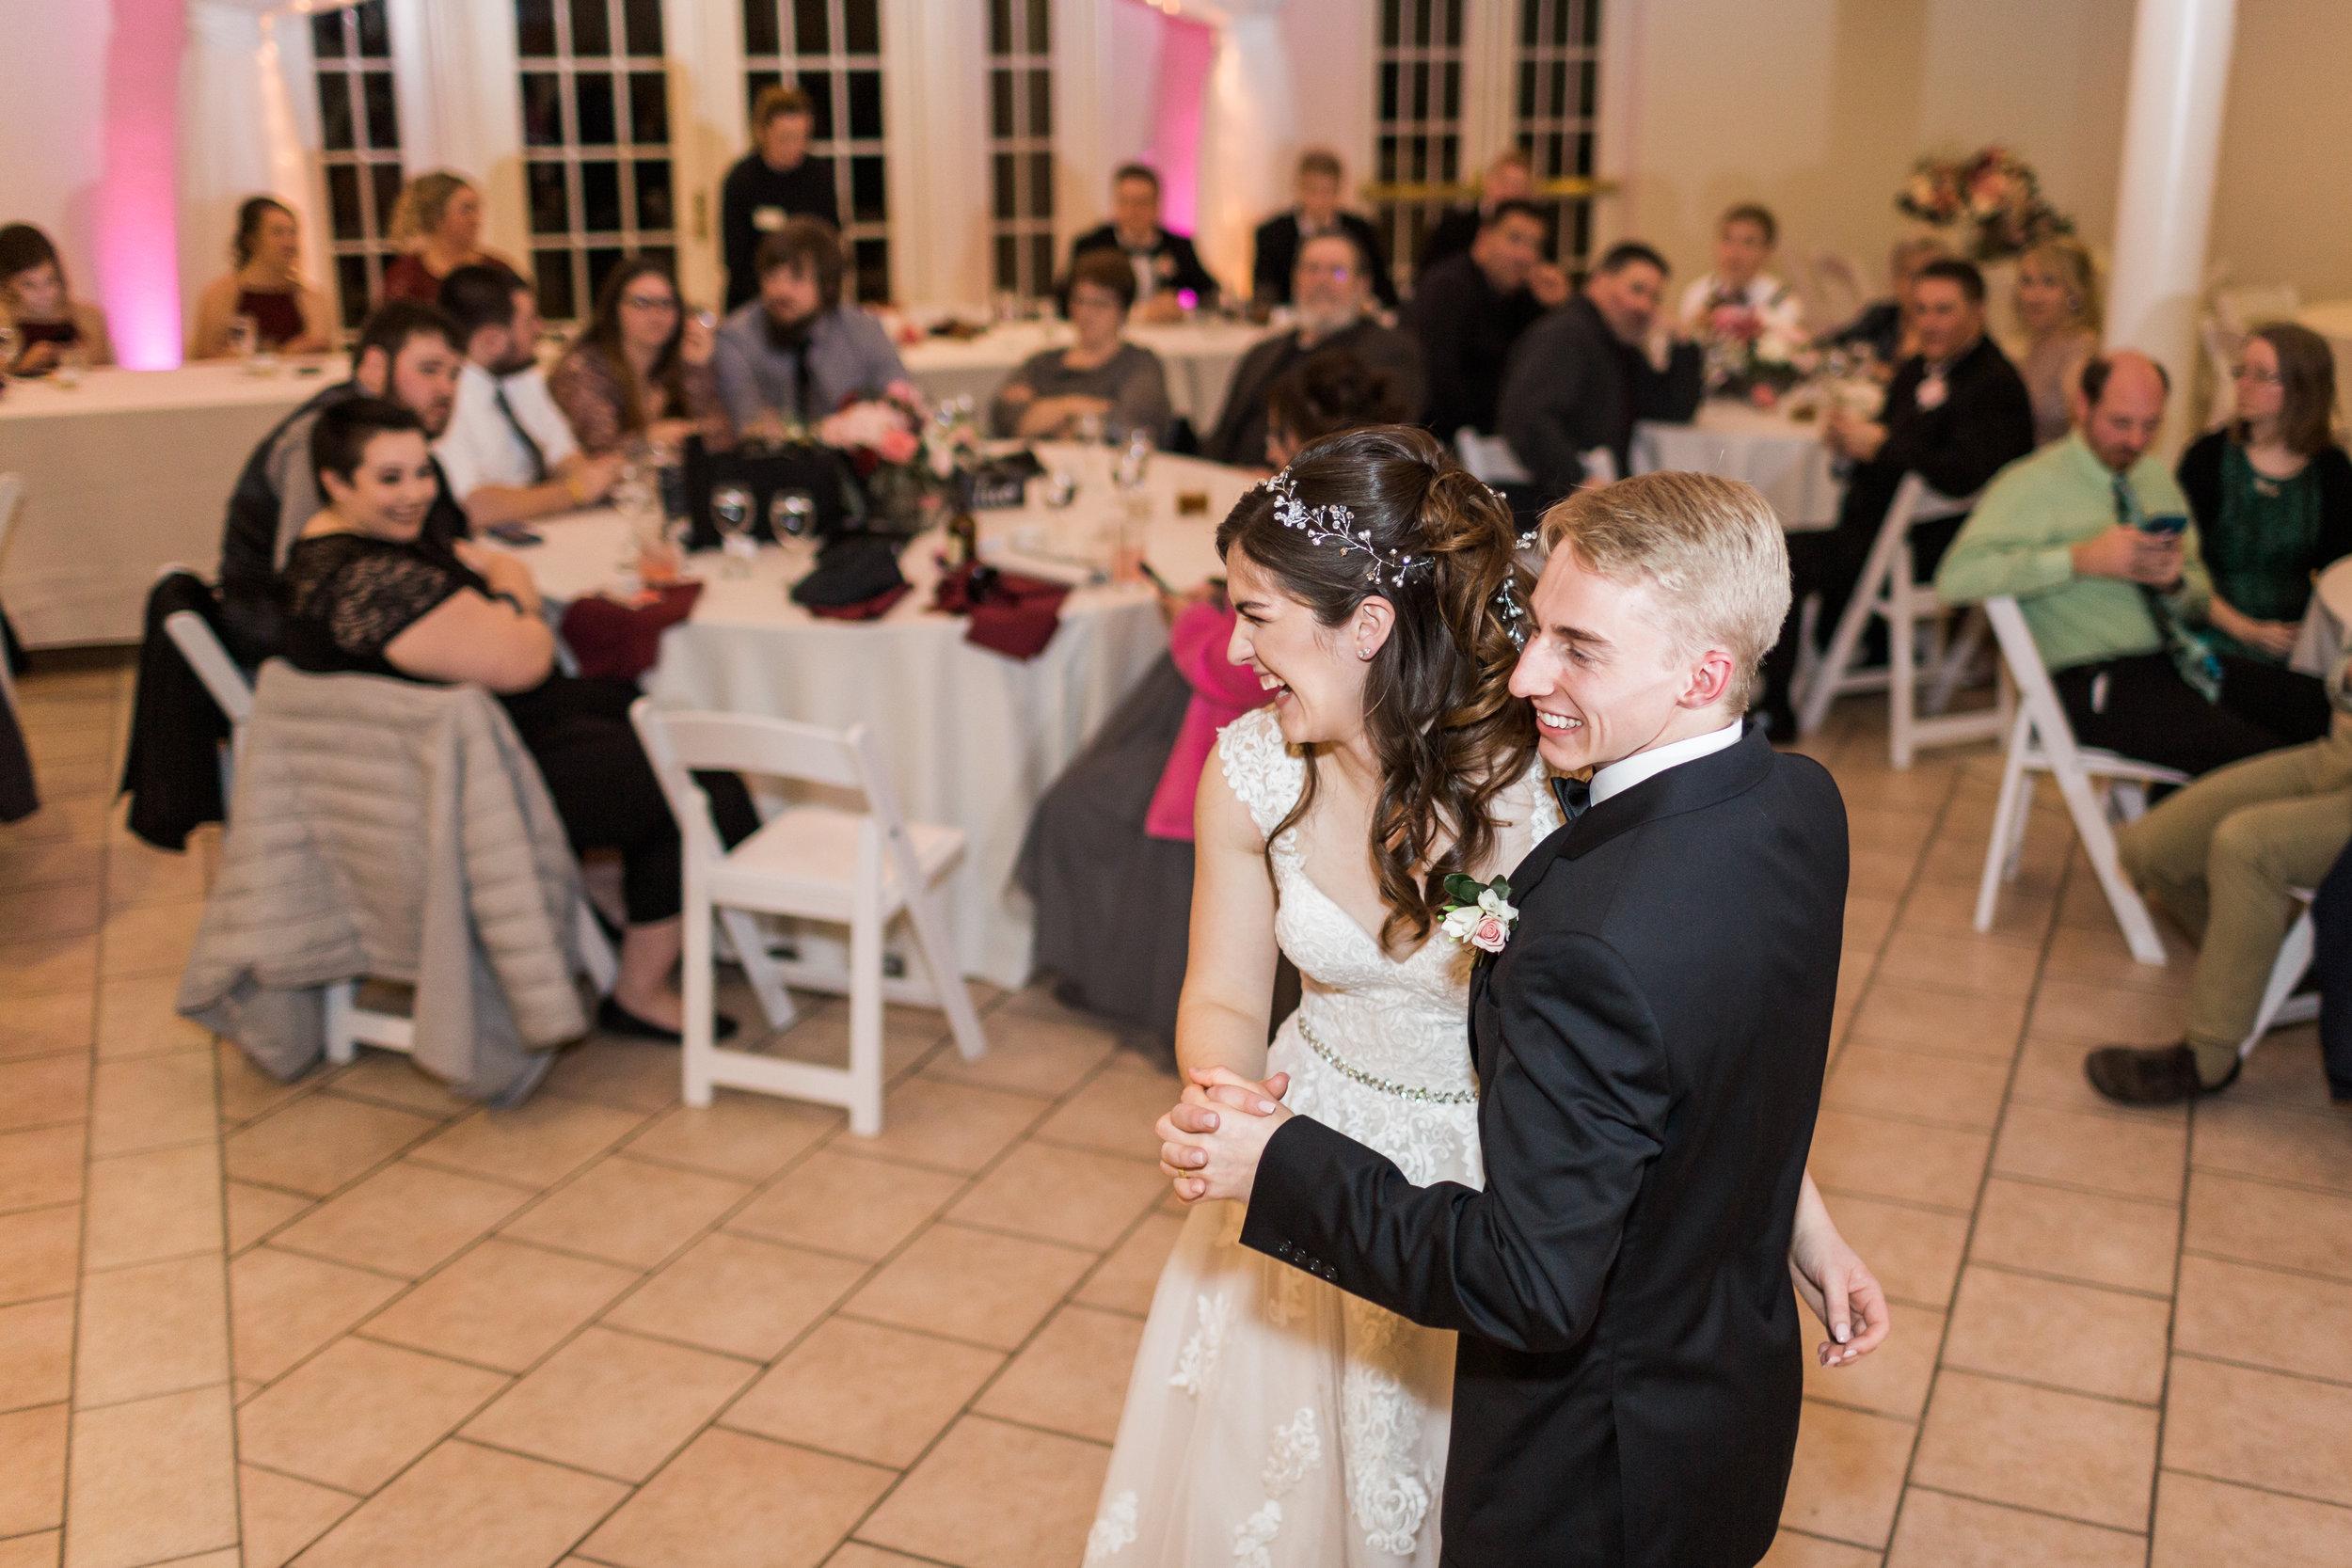 romanticcoloradodestinationwedding-54.jpg